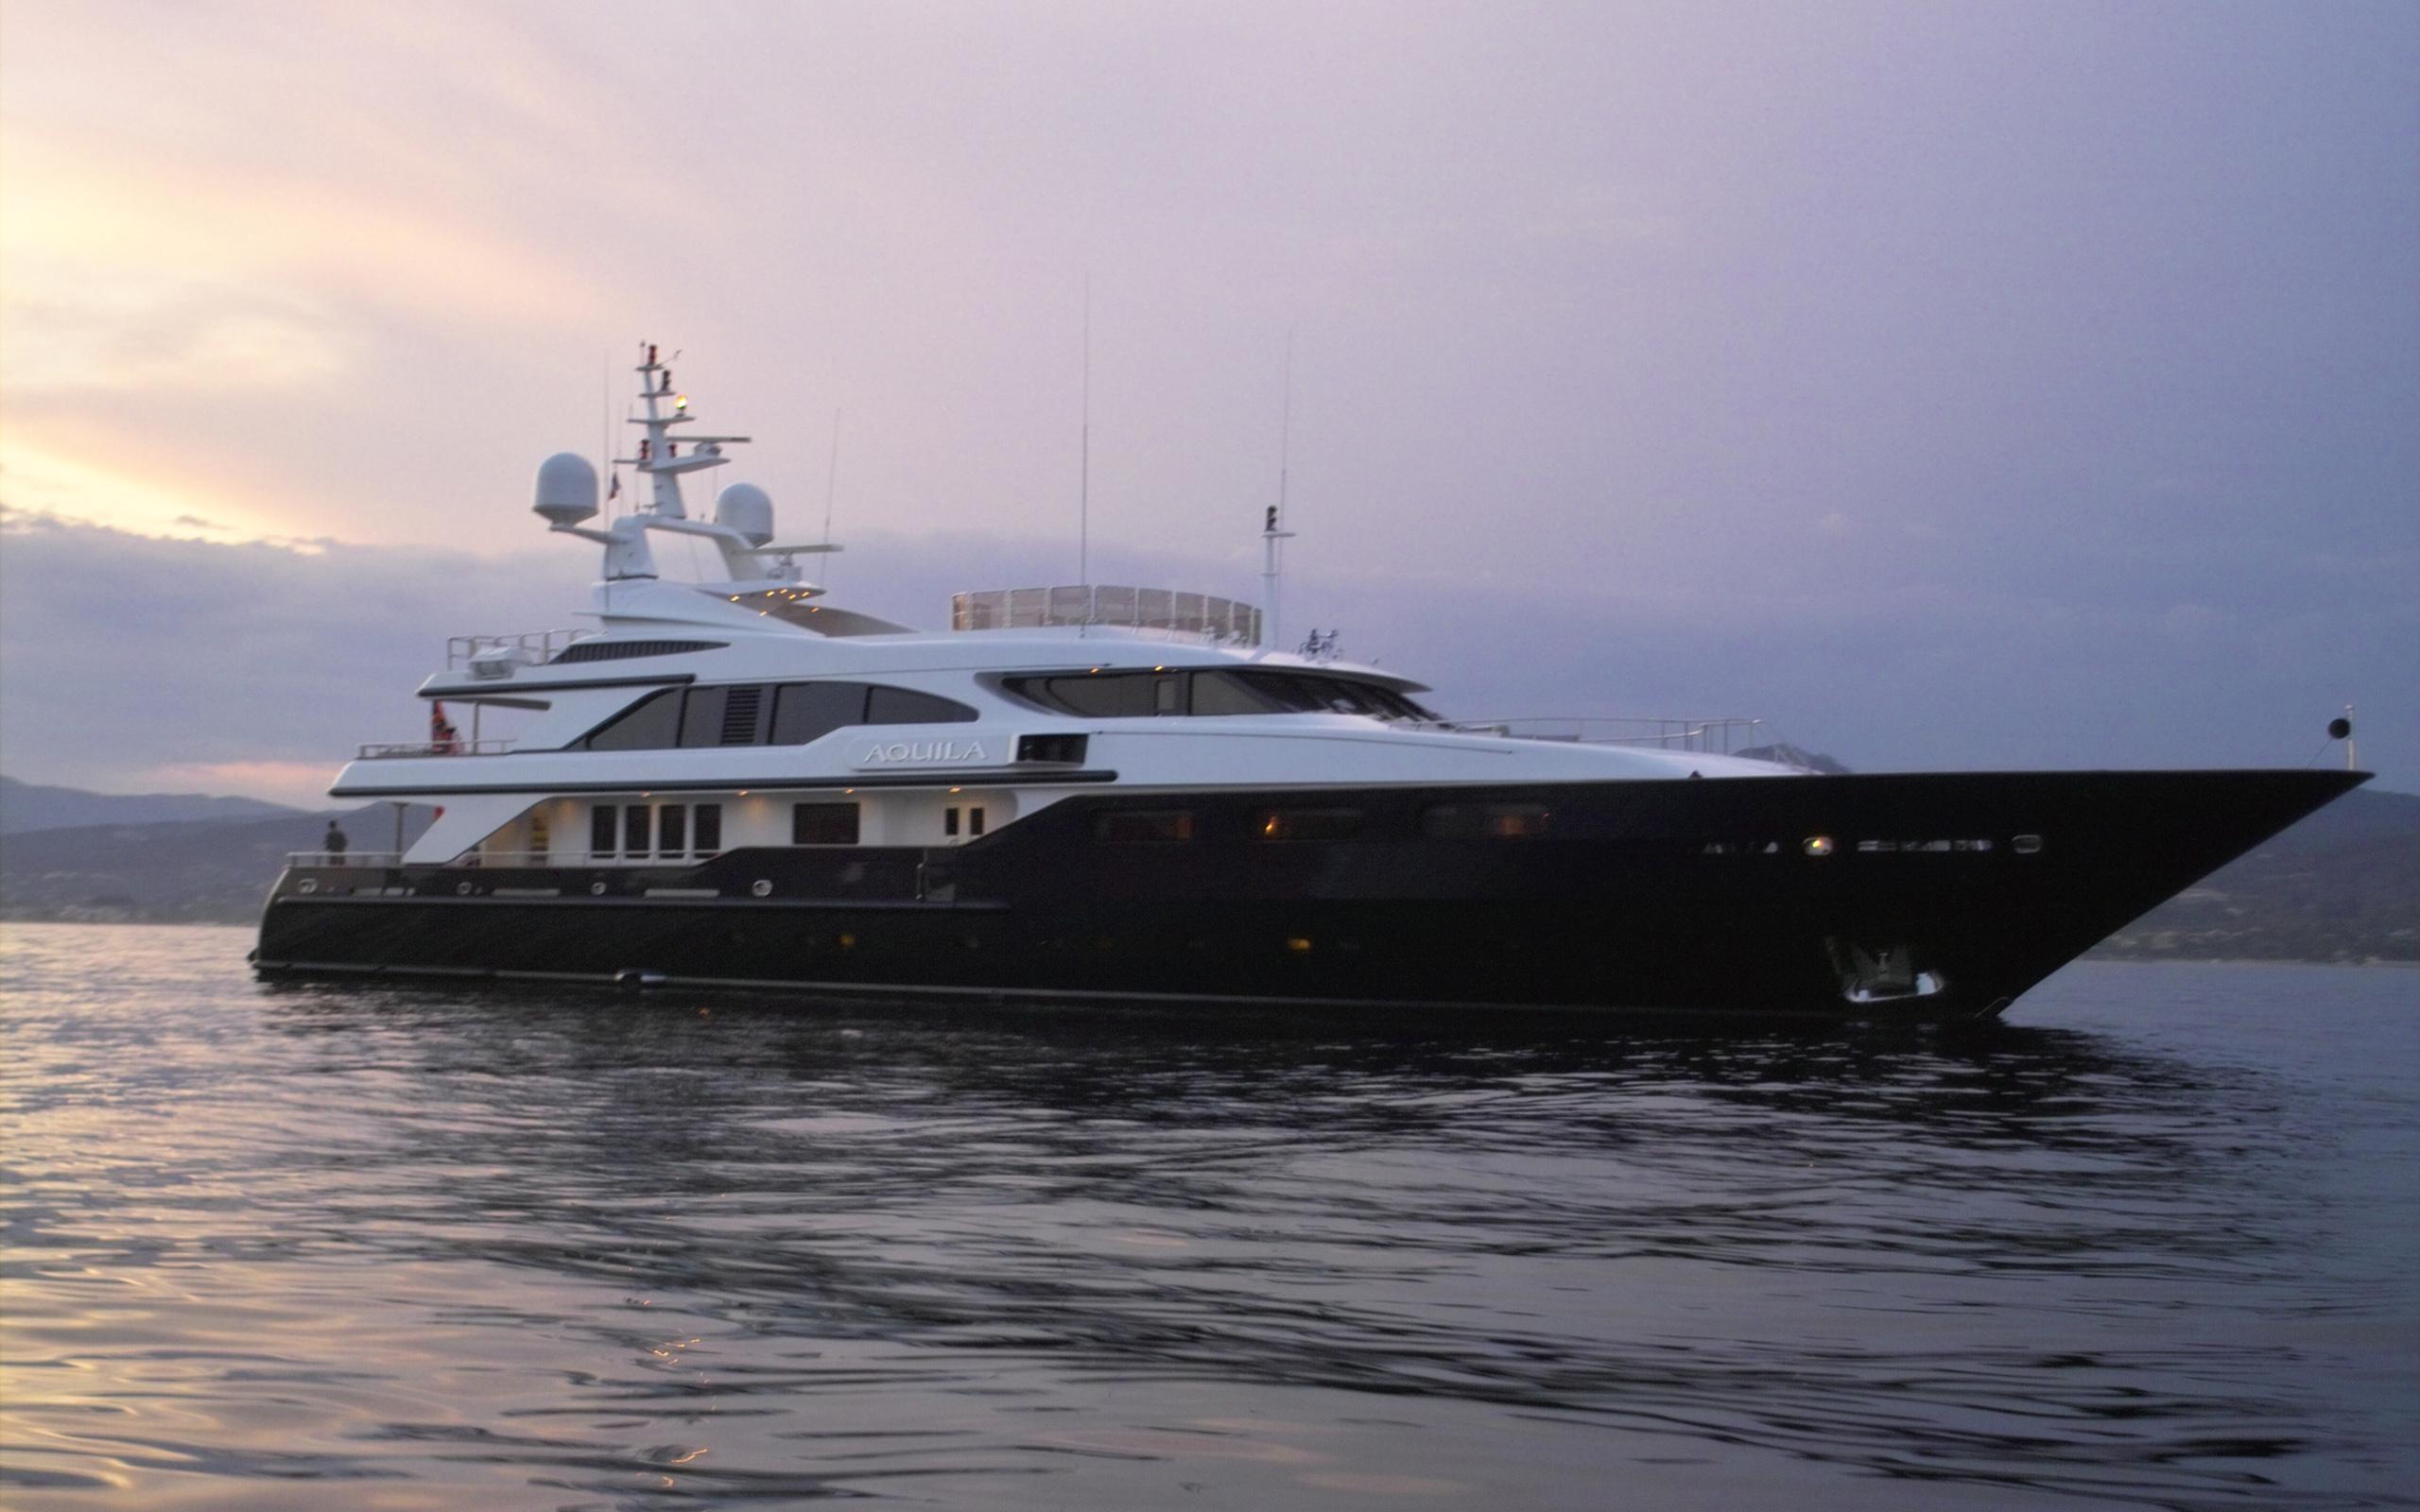 Luxury Yacht In The Gulf Of Saint Tropez 2006